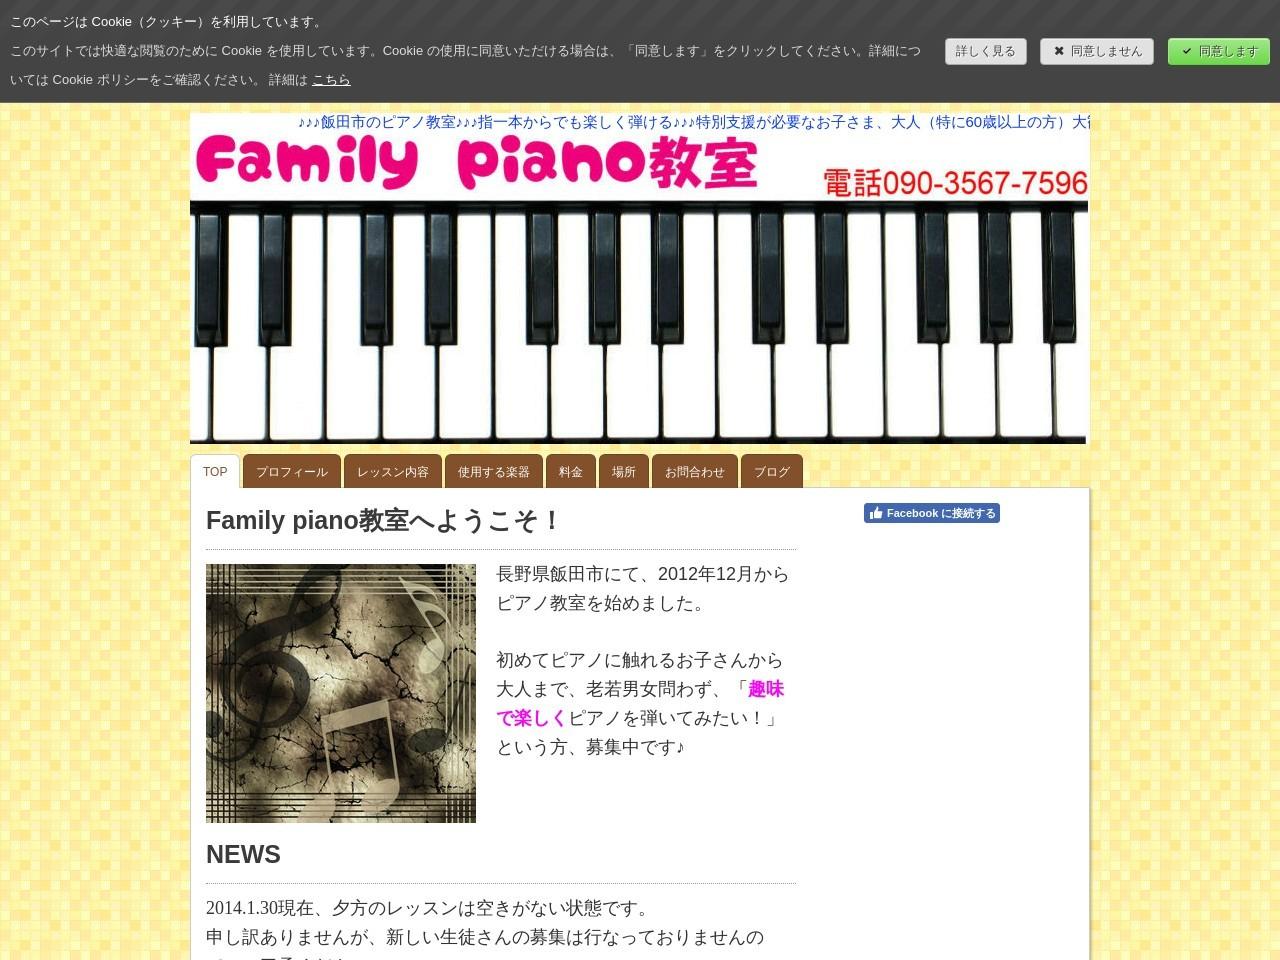 Family piano教室のサムネイル